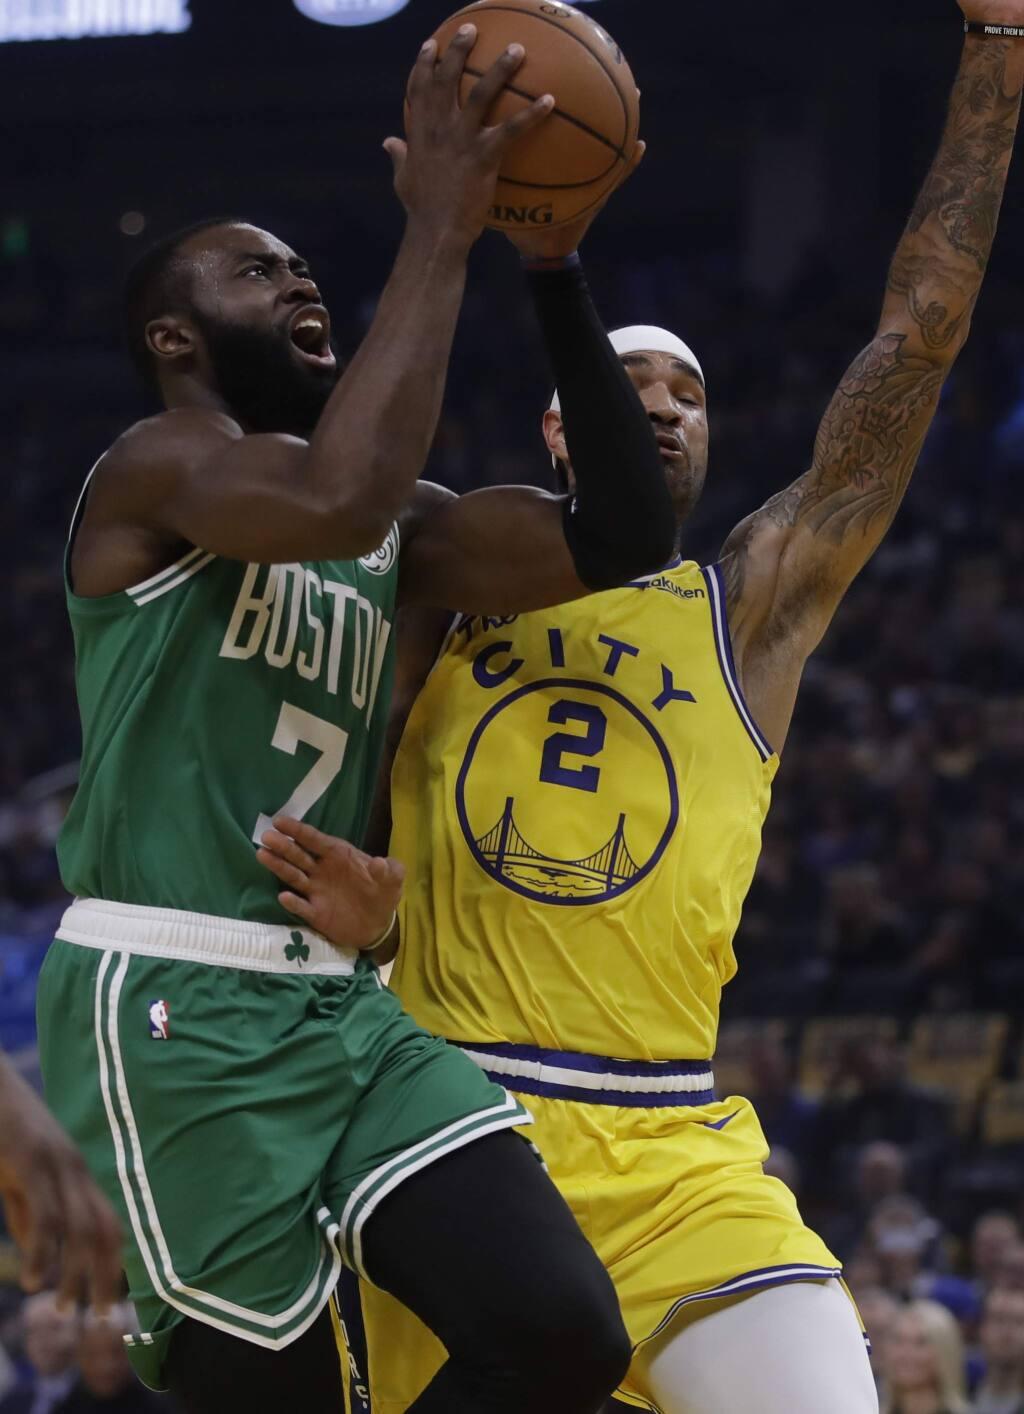 Boston Celtics' Jaylen Brown, left, shoots against Golden State Warriors' Willie Cauley-Stein (2) in the first half of an NBA basketball game Friday, Nov. 15, 2019, in San Francisco. (AP Photo/Ben Margot)